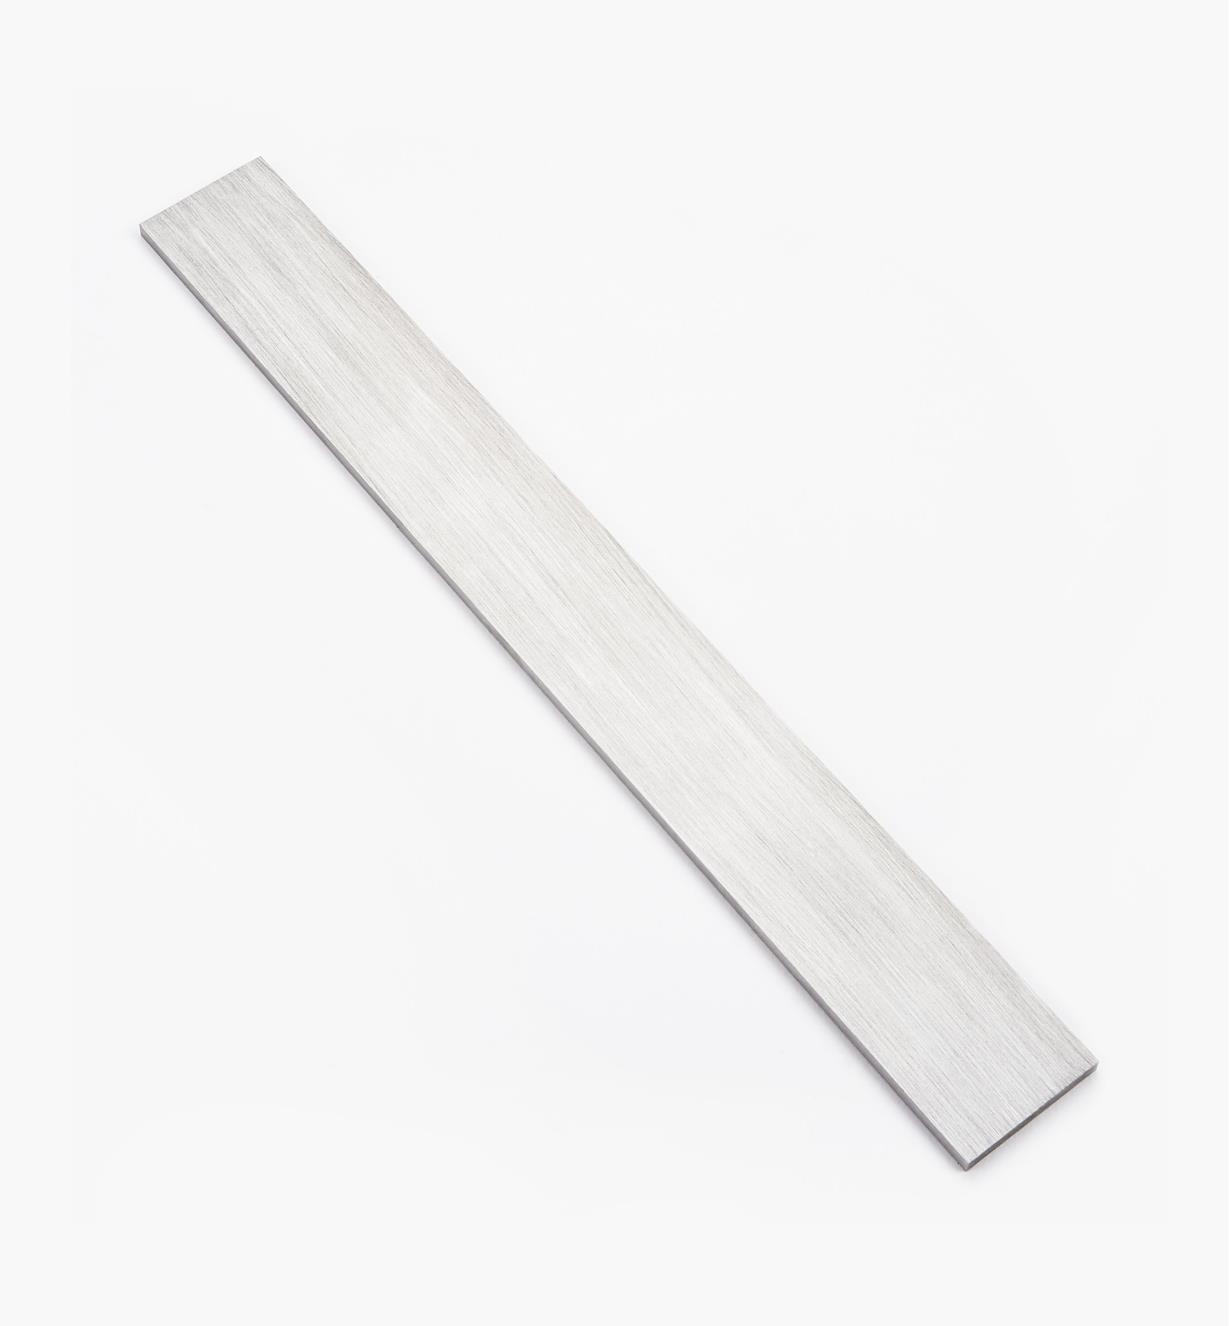 "30N3210 - 12"" Starrett Precision Steel Straightedge"